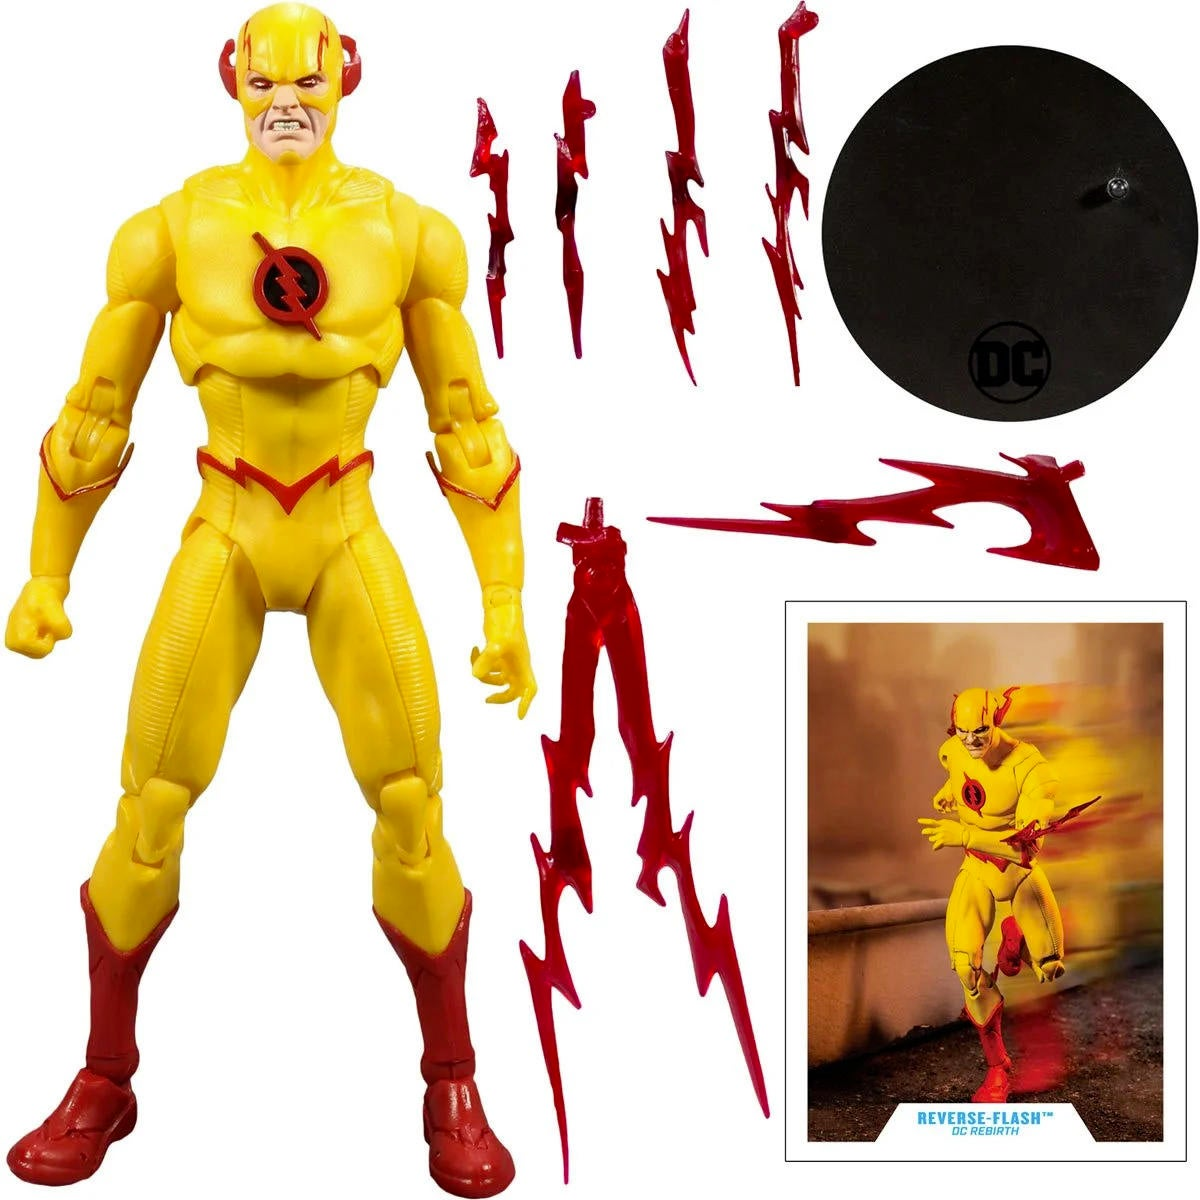 mcfarlane-toys-reverse-flash.jpg